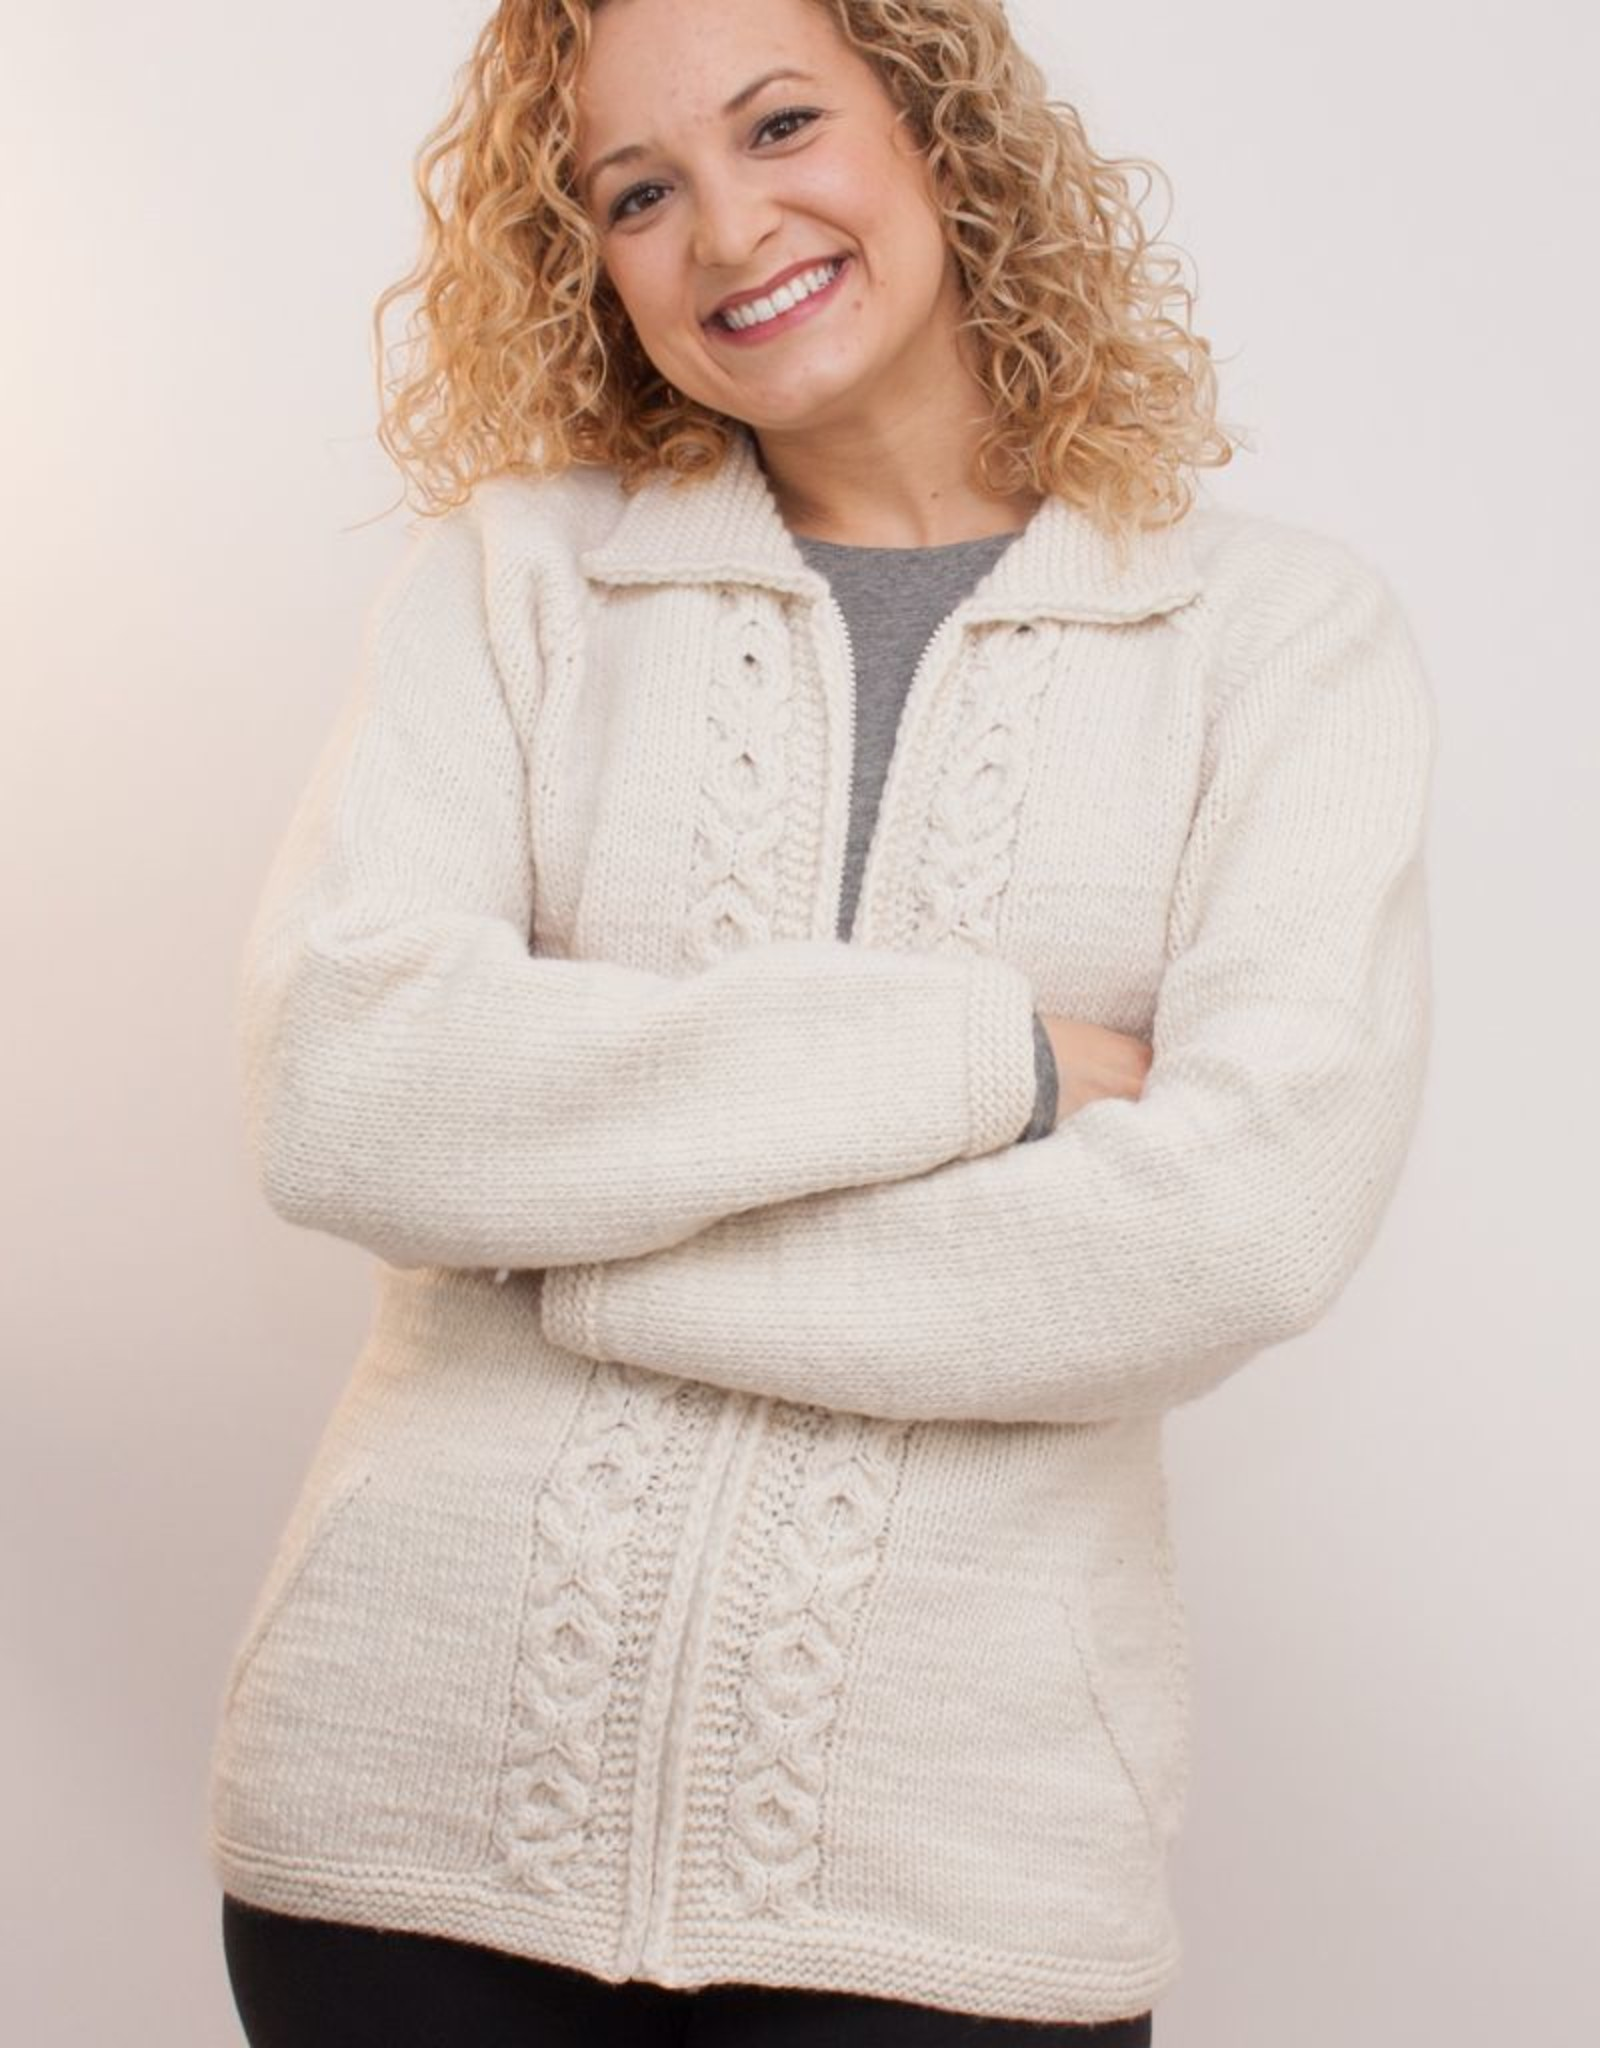 The Sweater Venture Maritza Cable Front Zip